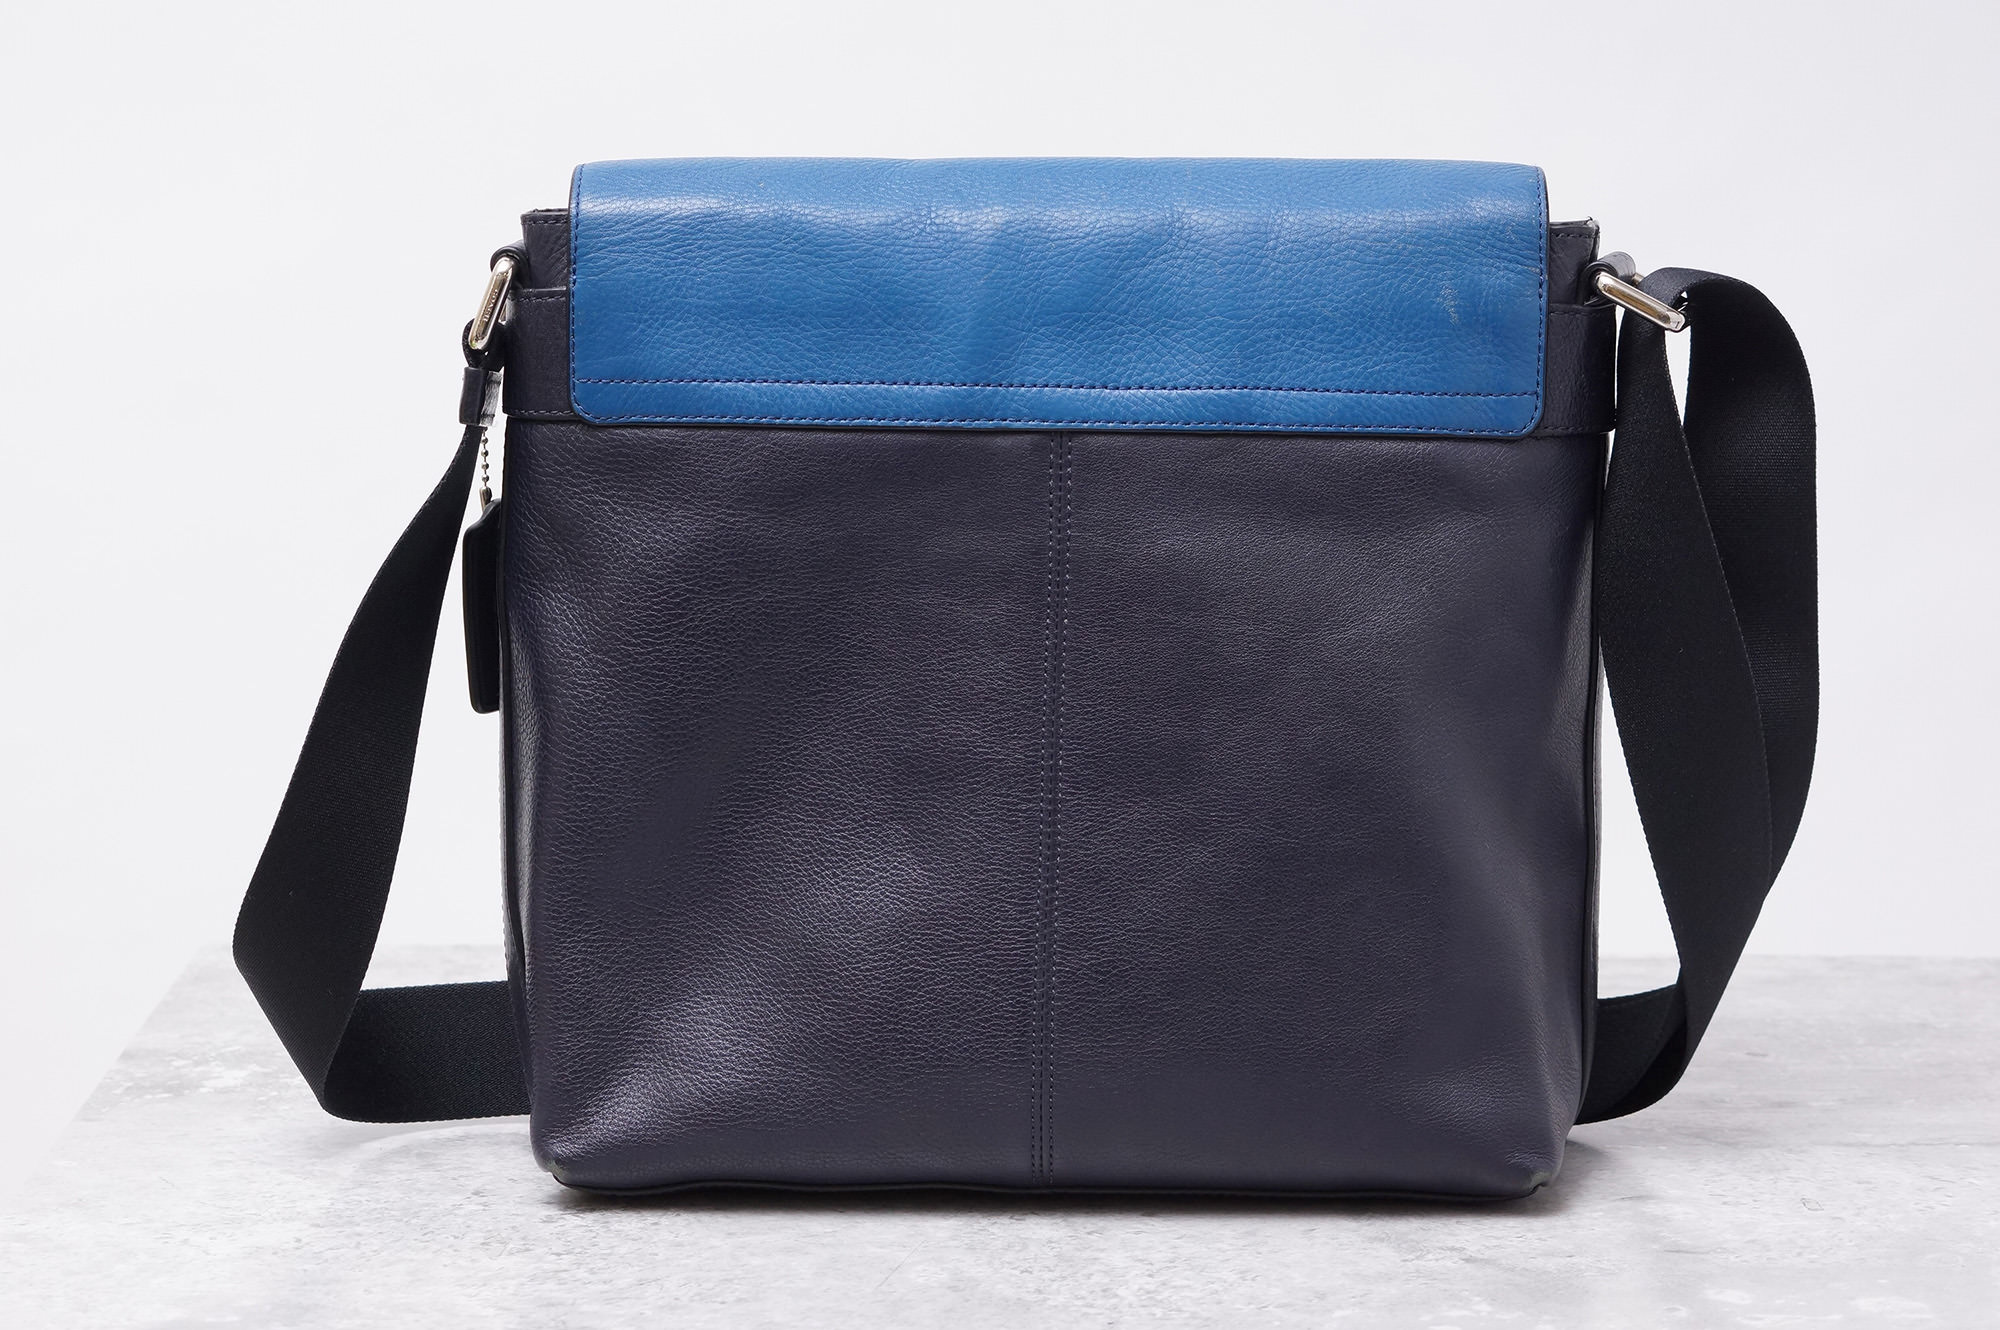 6e38607fd0e1 代購代標第一品牌- 樂淘letao - COACH コーチショルダーバッグ鞄F72108 ...